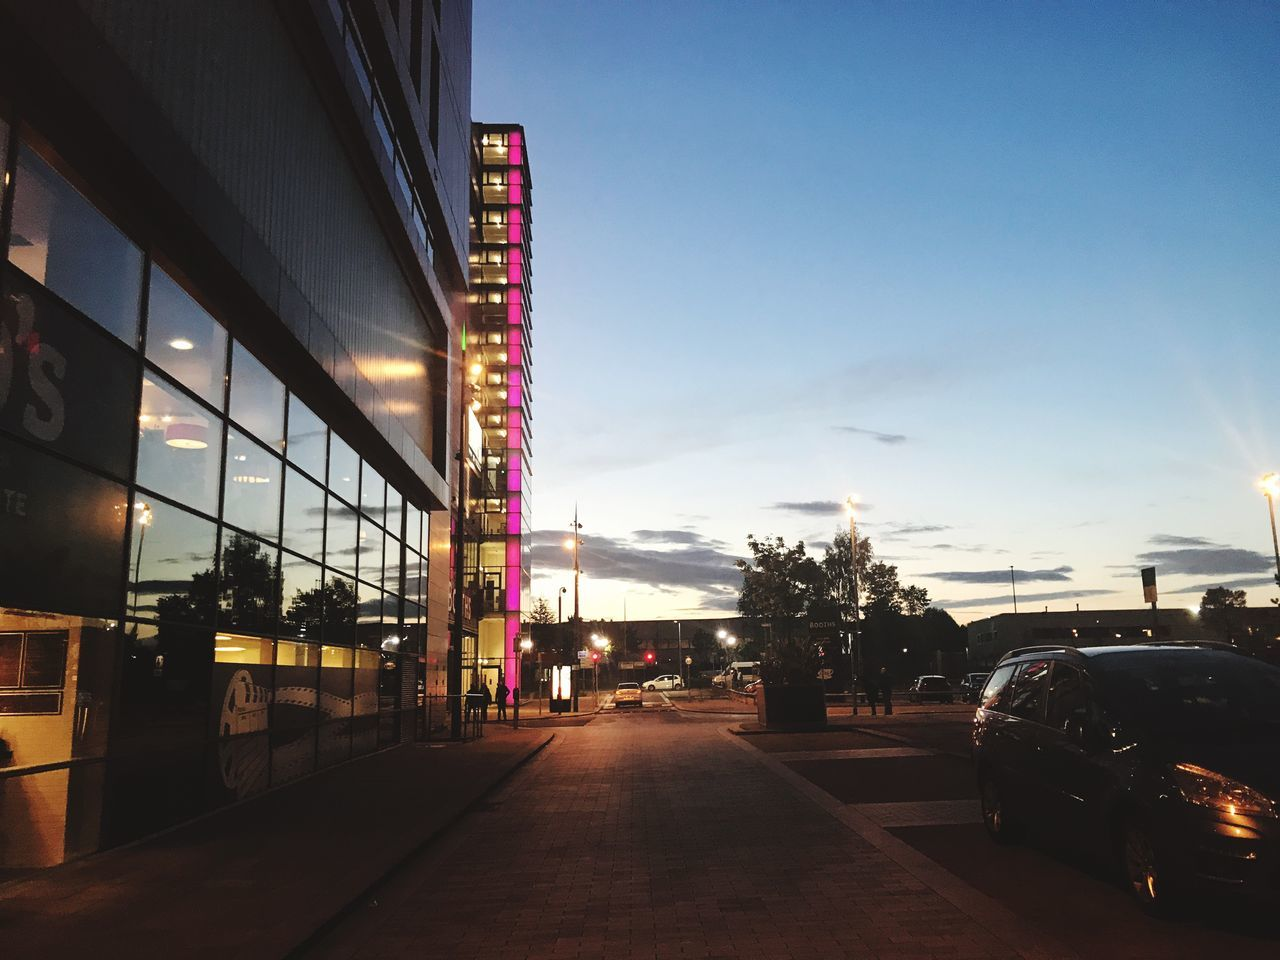 Architecture Car Built Structure City Road Illuminated Sunset Manchester Mediacityuk Cloud - Sky Night